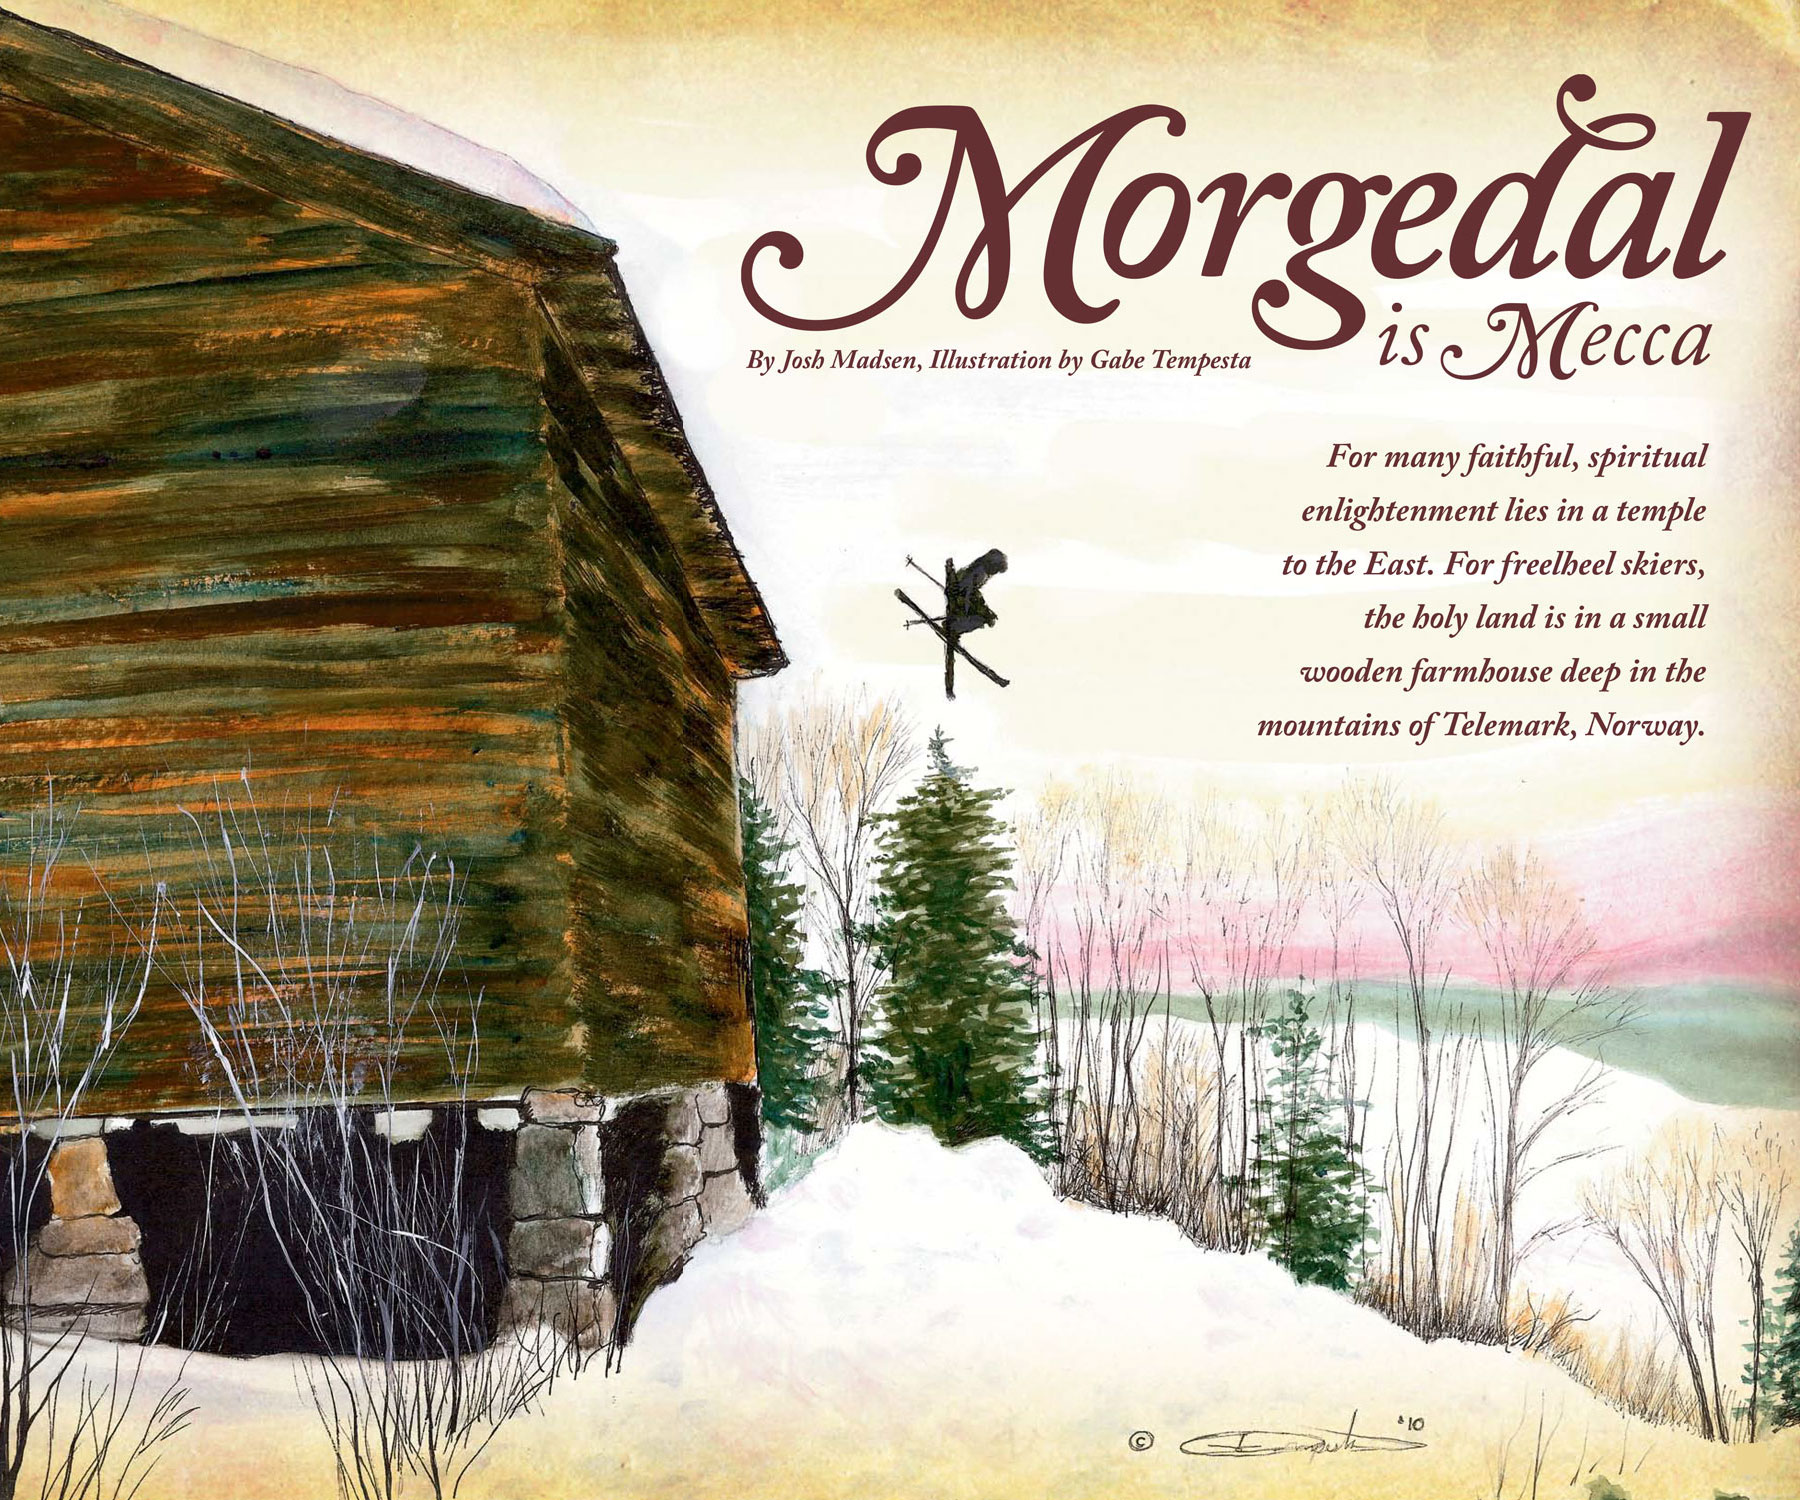 Morgedal